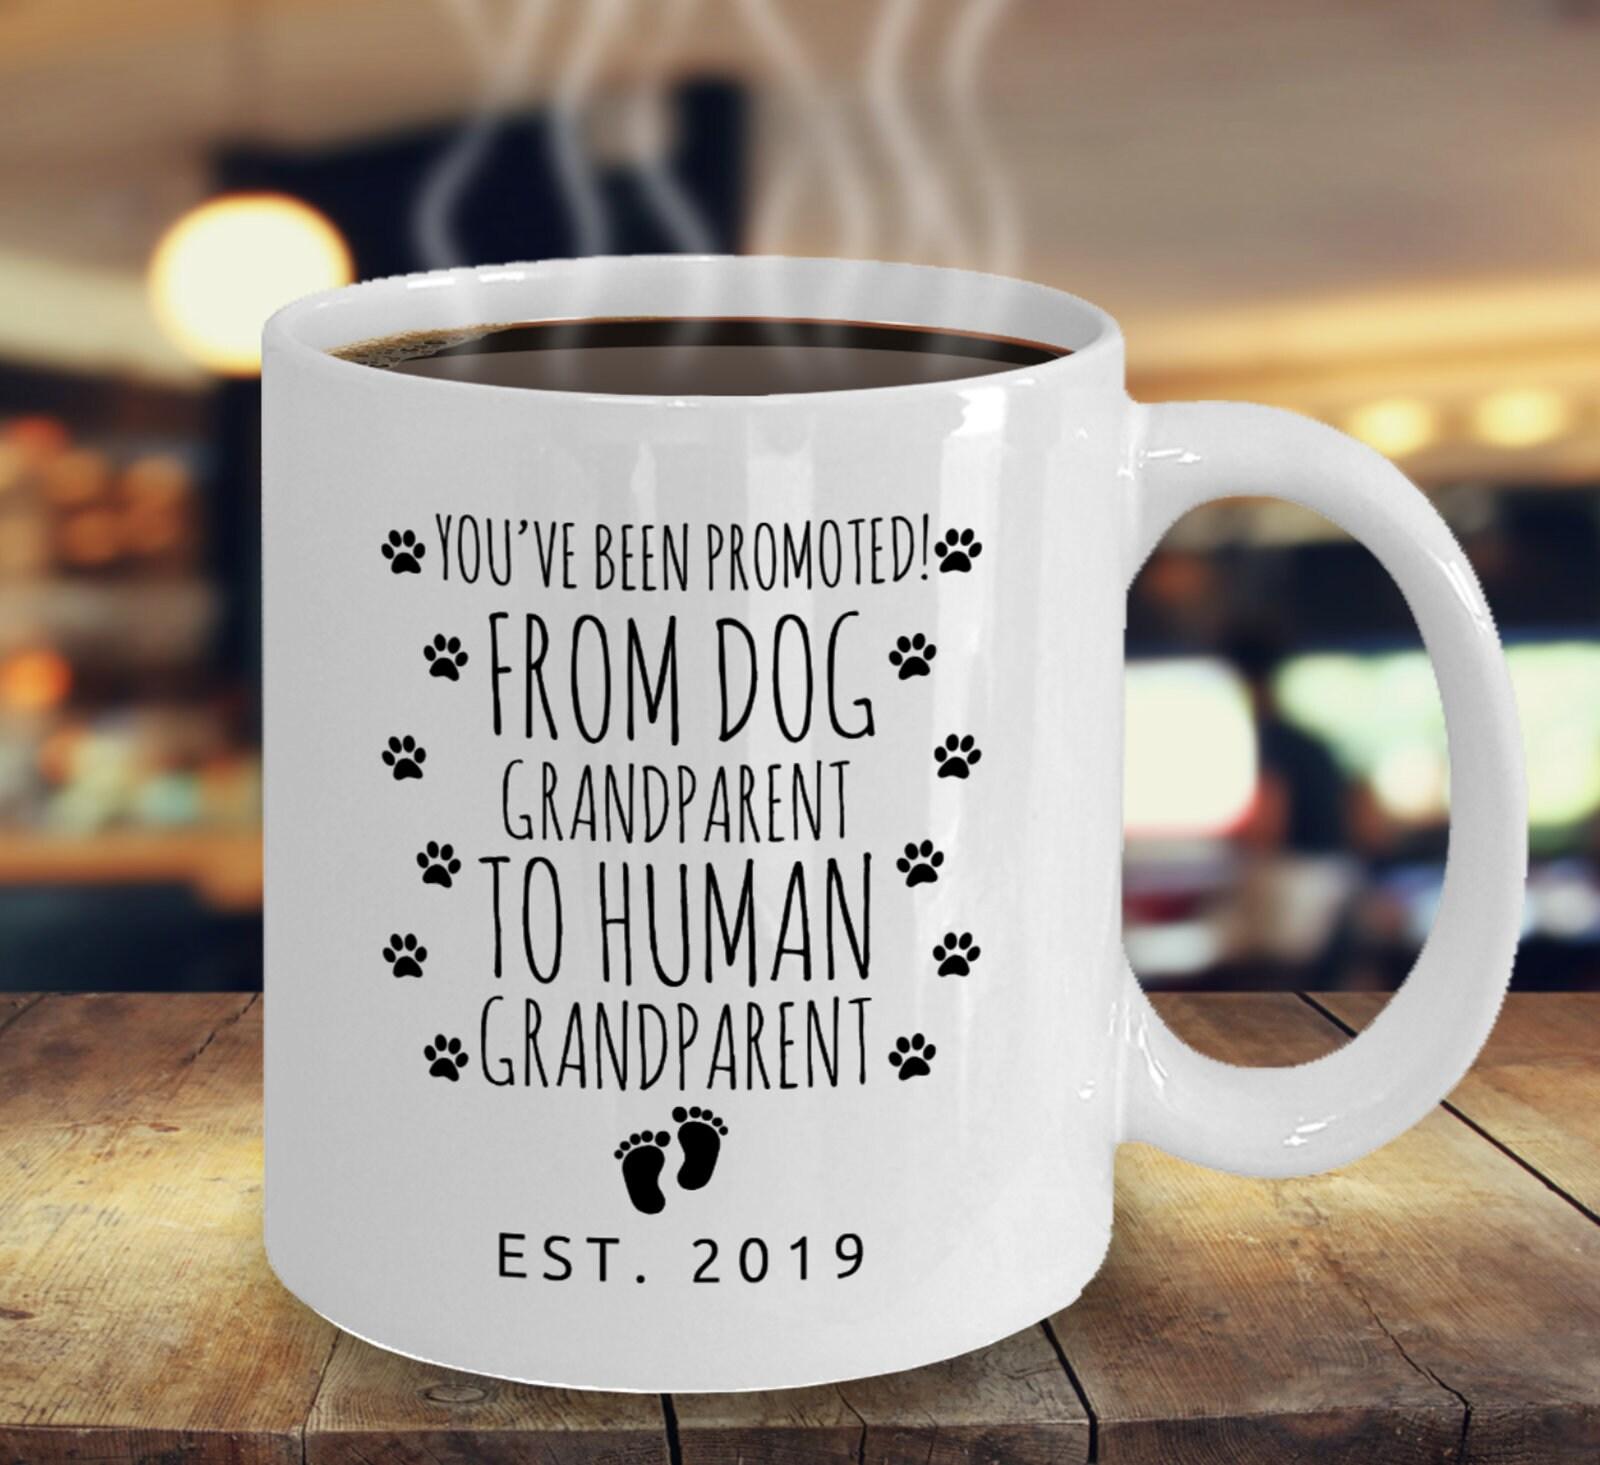 Dog Grandparent To Human Grandparent Mug Pregnancy